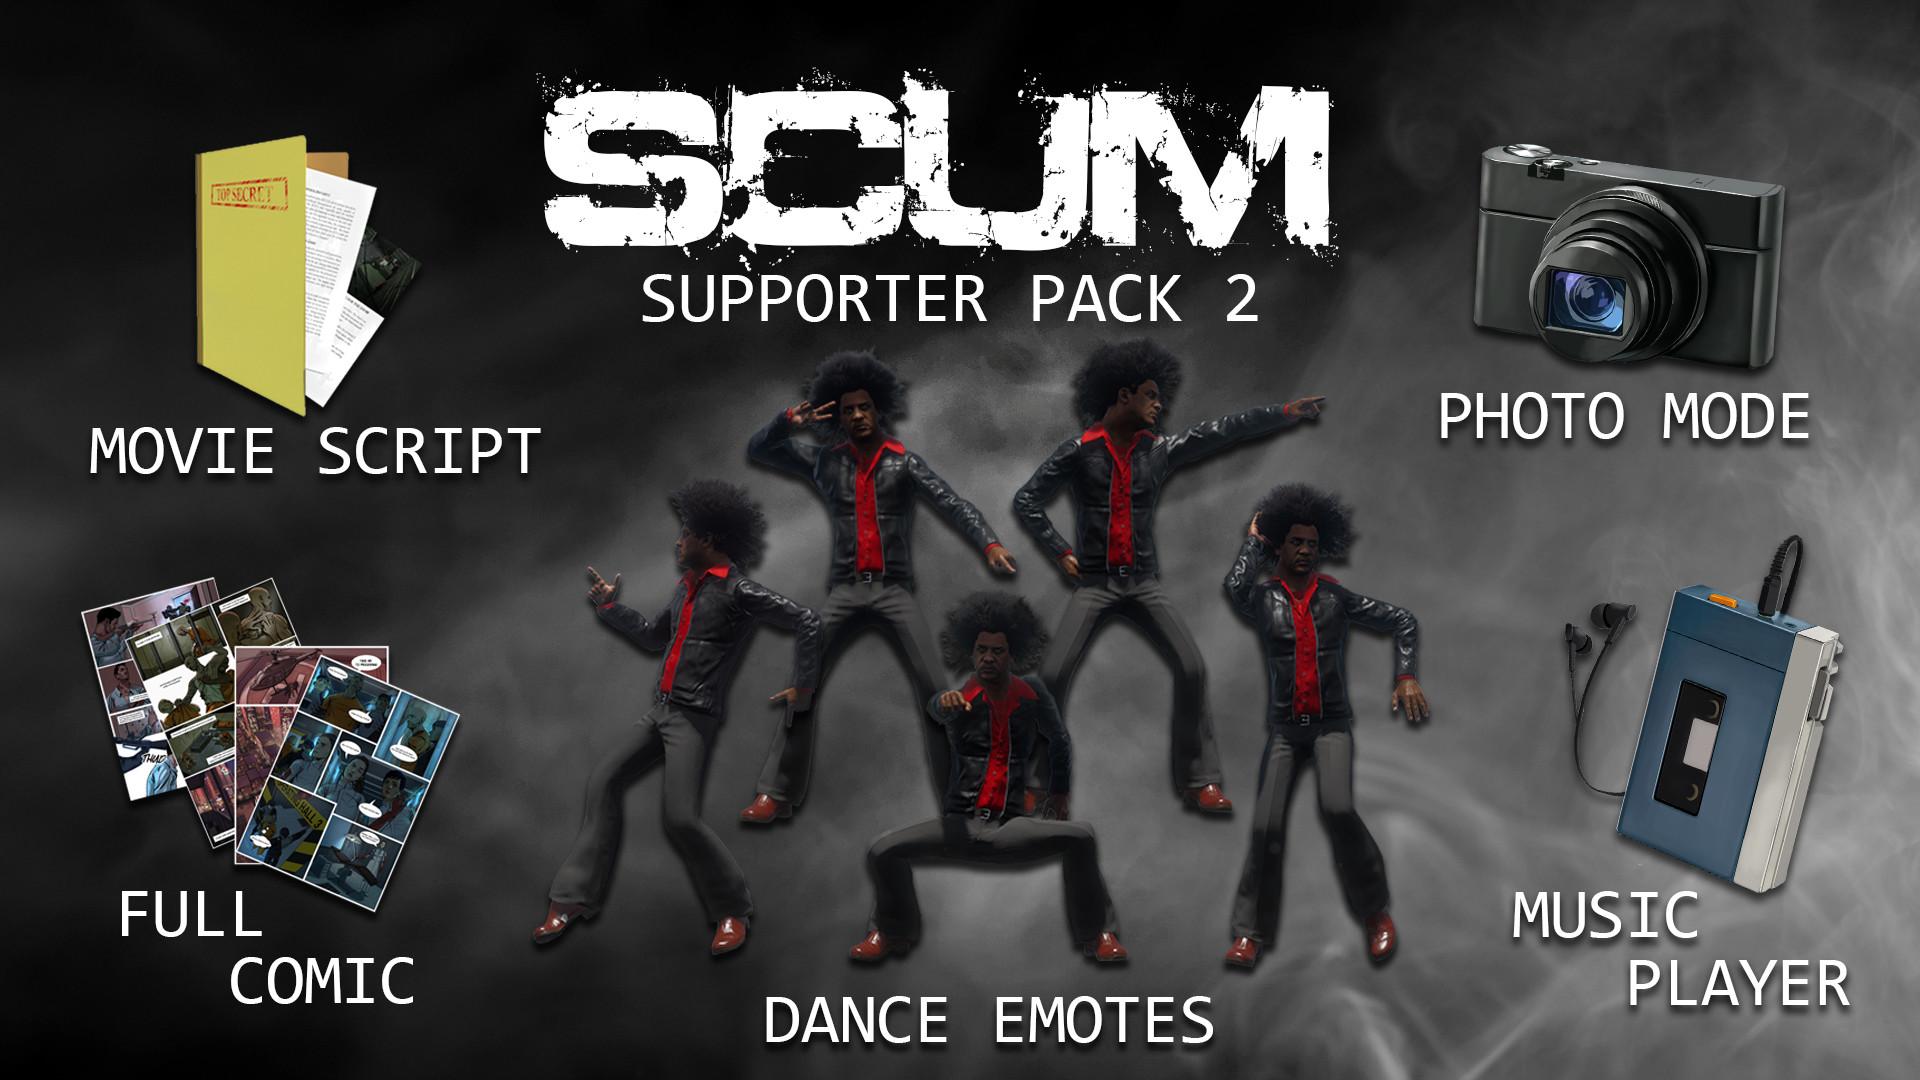 SCUM Supporter Pack 2